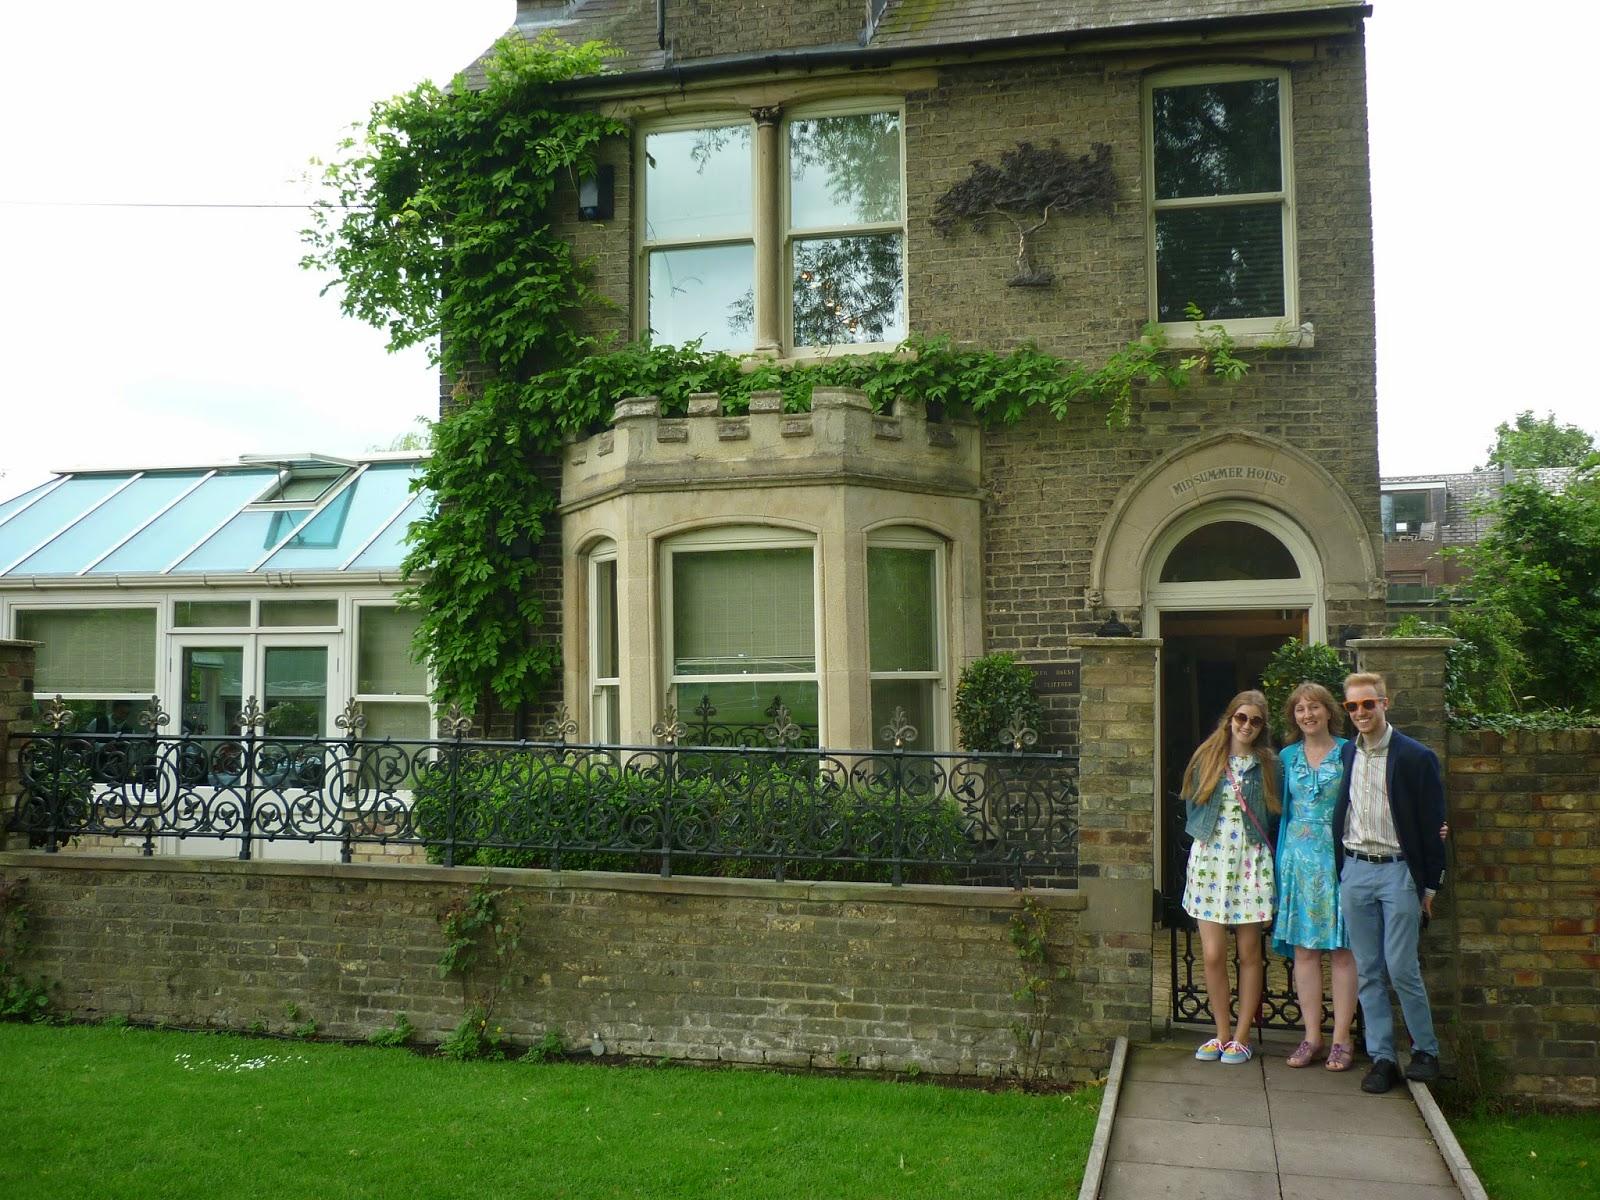 Midsummer House Restaurant Cambridge imitationisthegreatestformofflattery: midsummer house - a 7